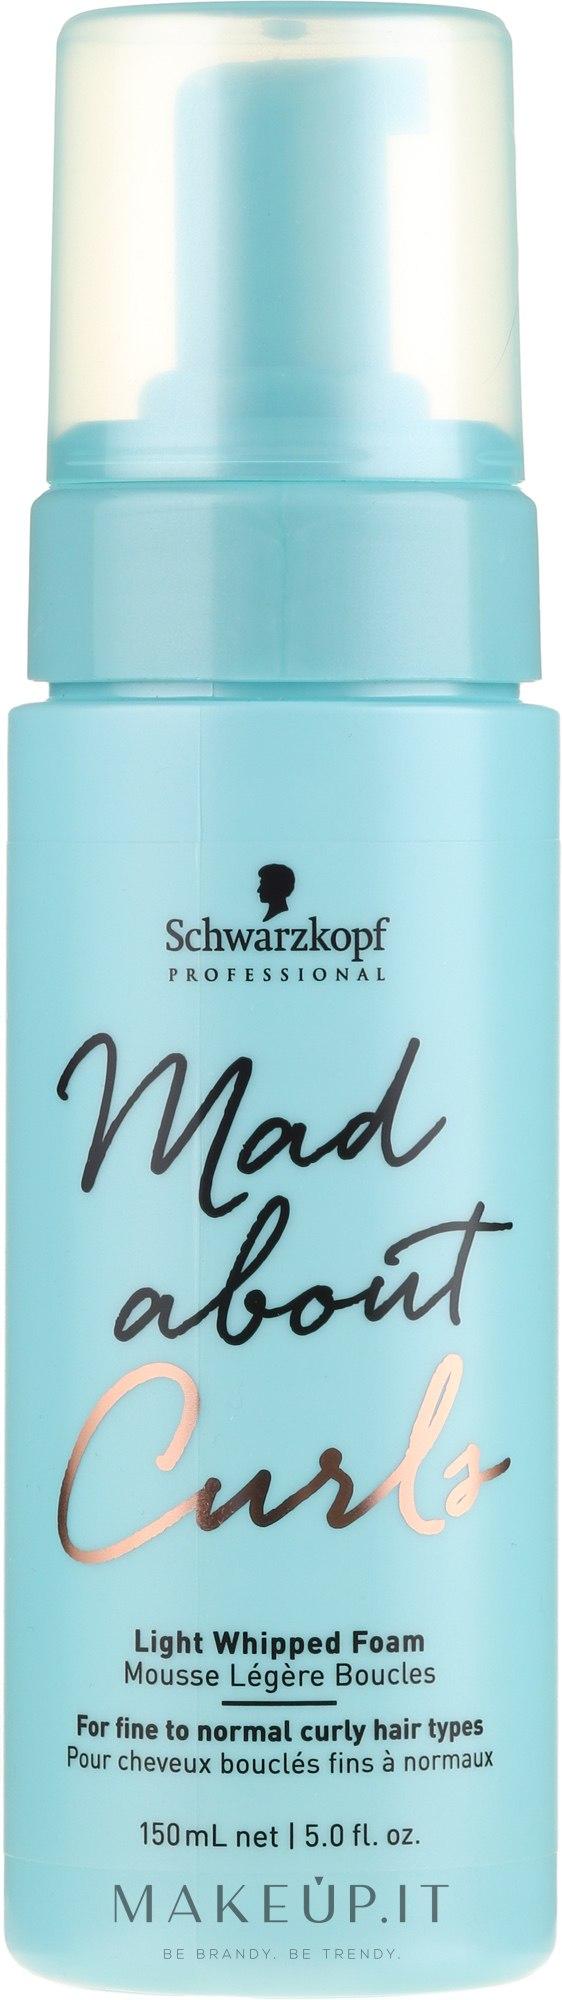 Schiuma per lo styling dei capelli - Schwarzkopf Professional Mad About Curls Light Whipped Foam — foto 150 ml